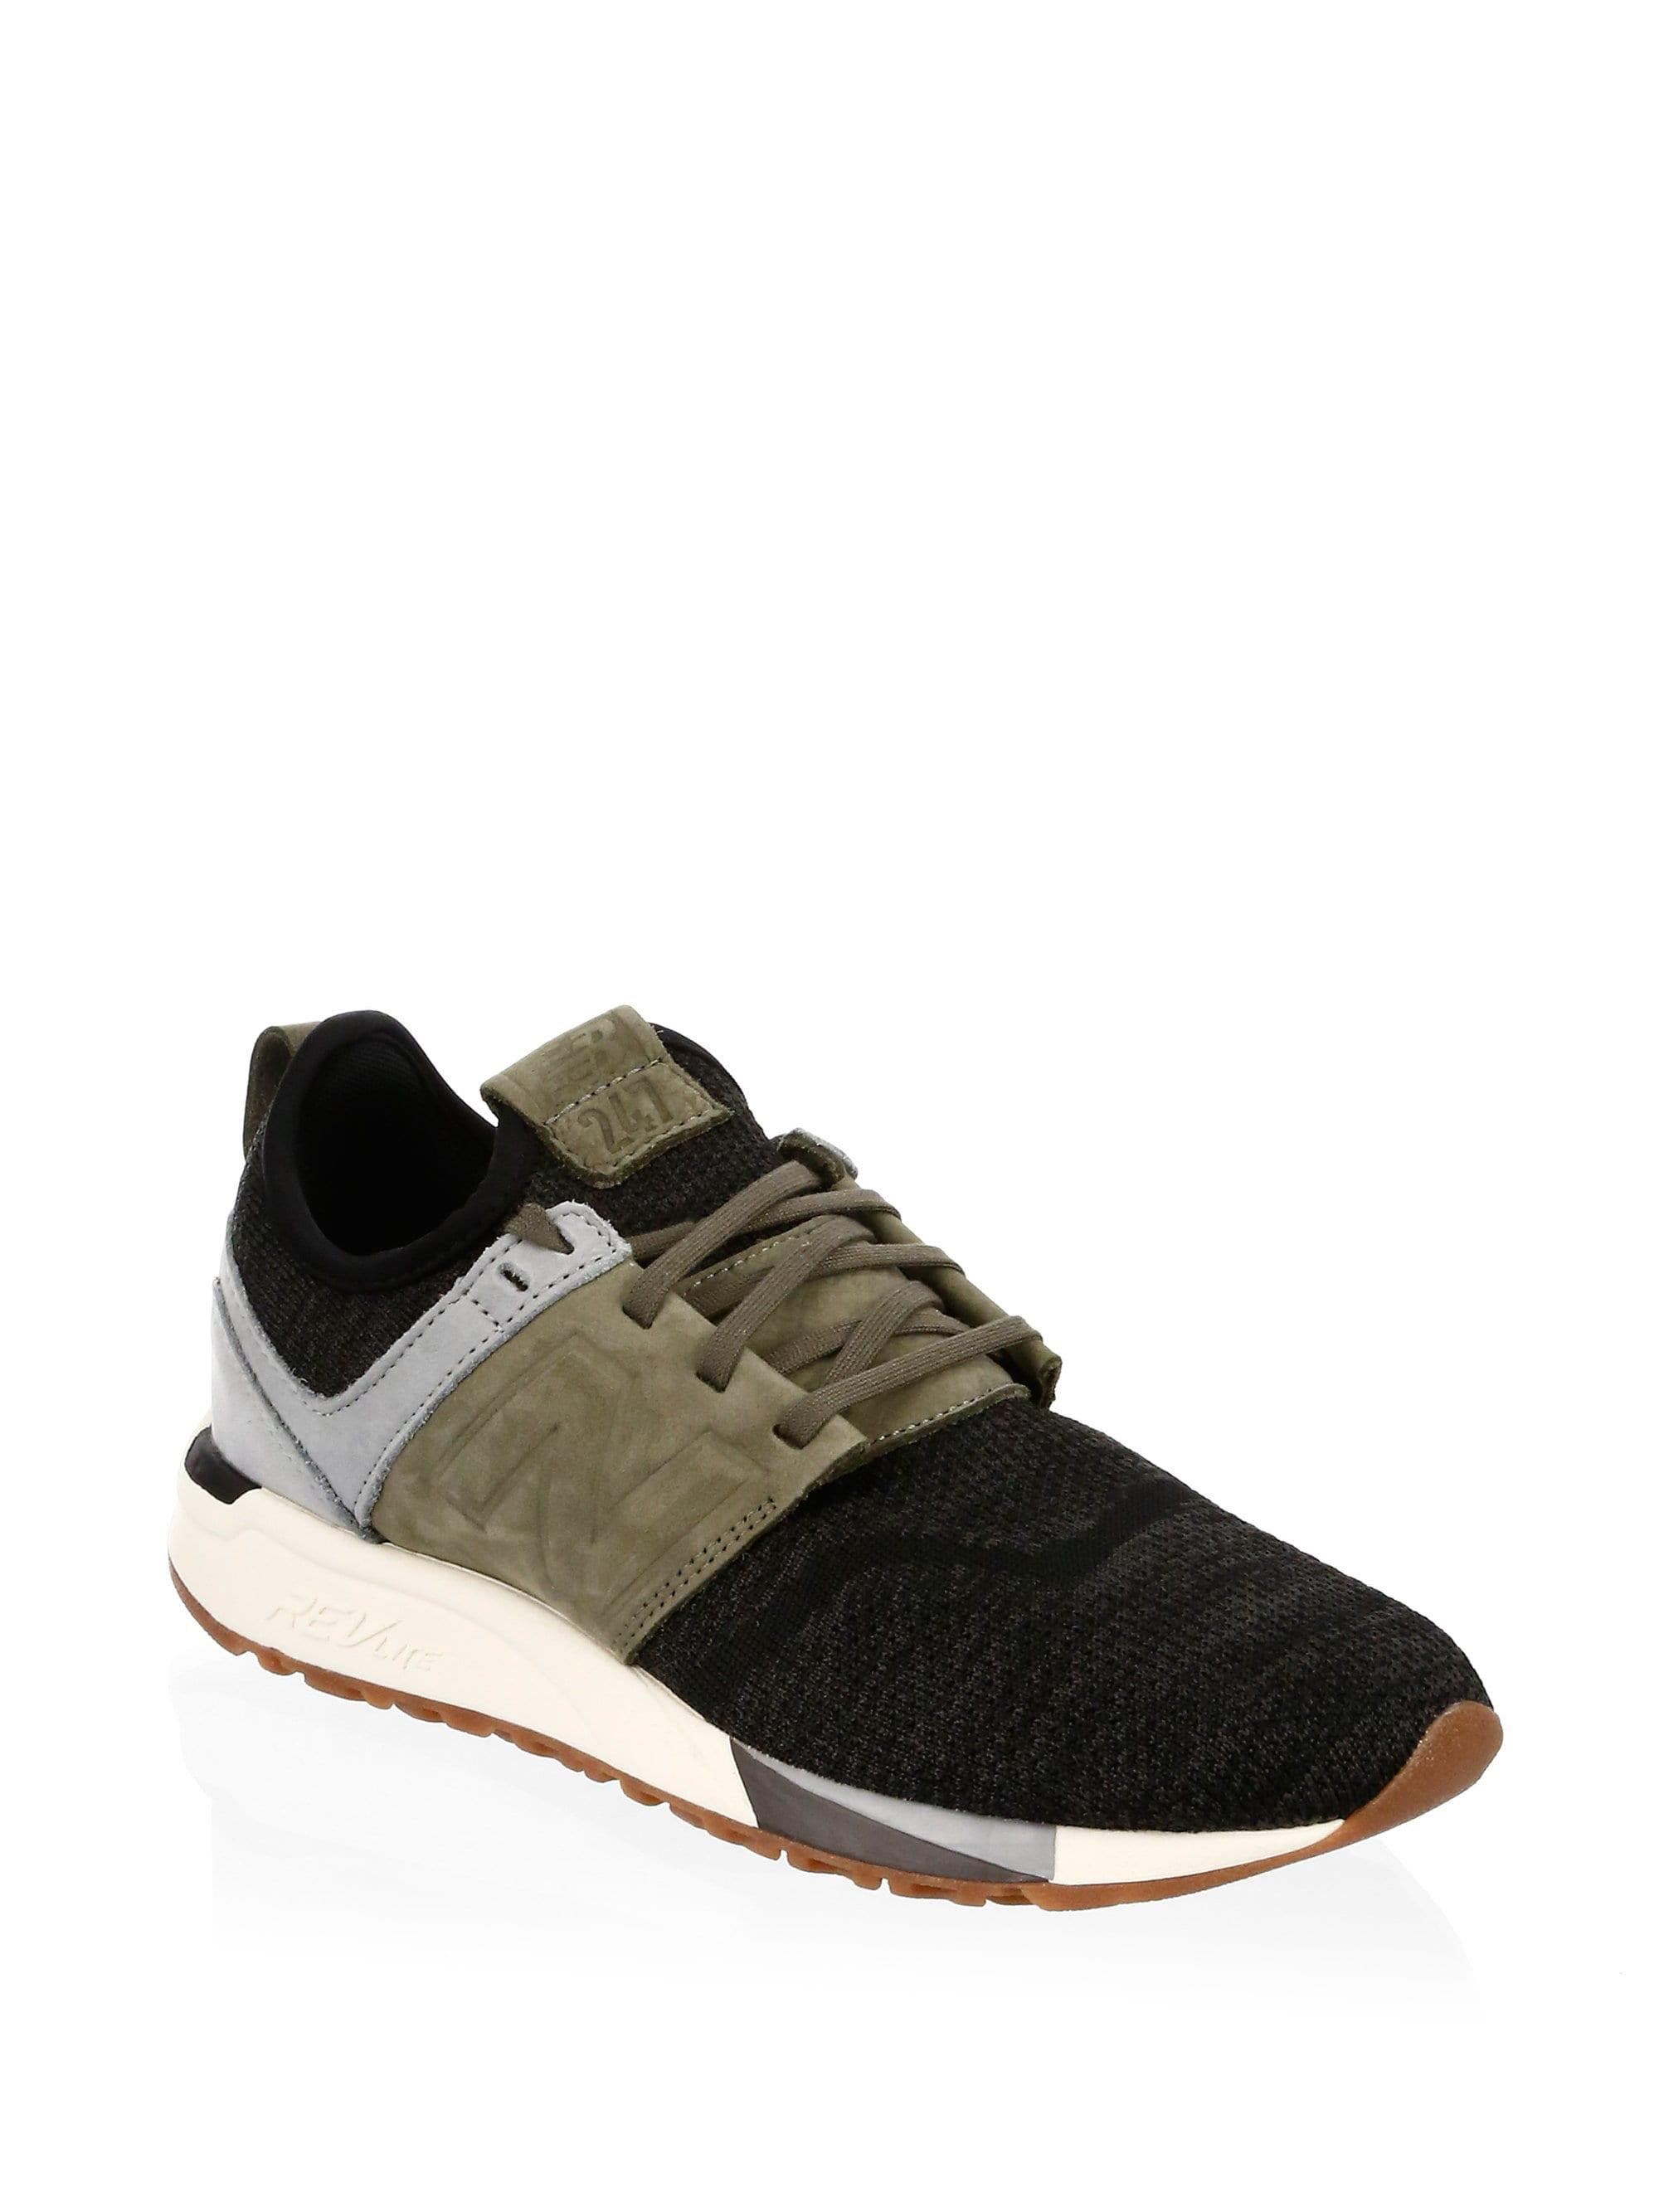 Lyst - New Balance Men s 247 Nubuck Knit Sneakers - Black Olive ... fde799d561a